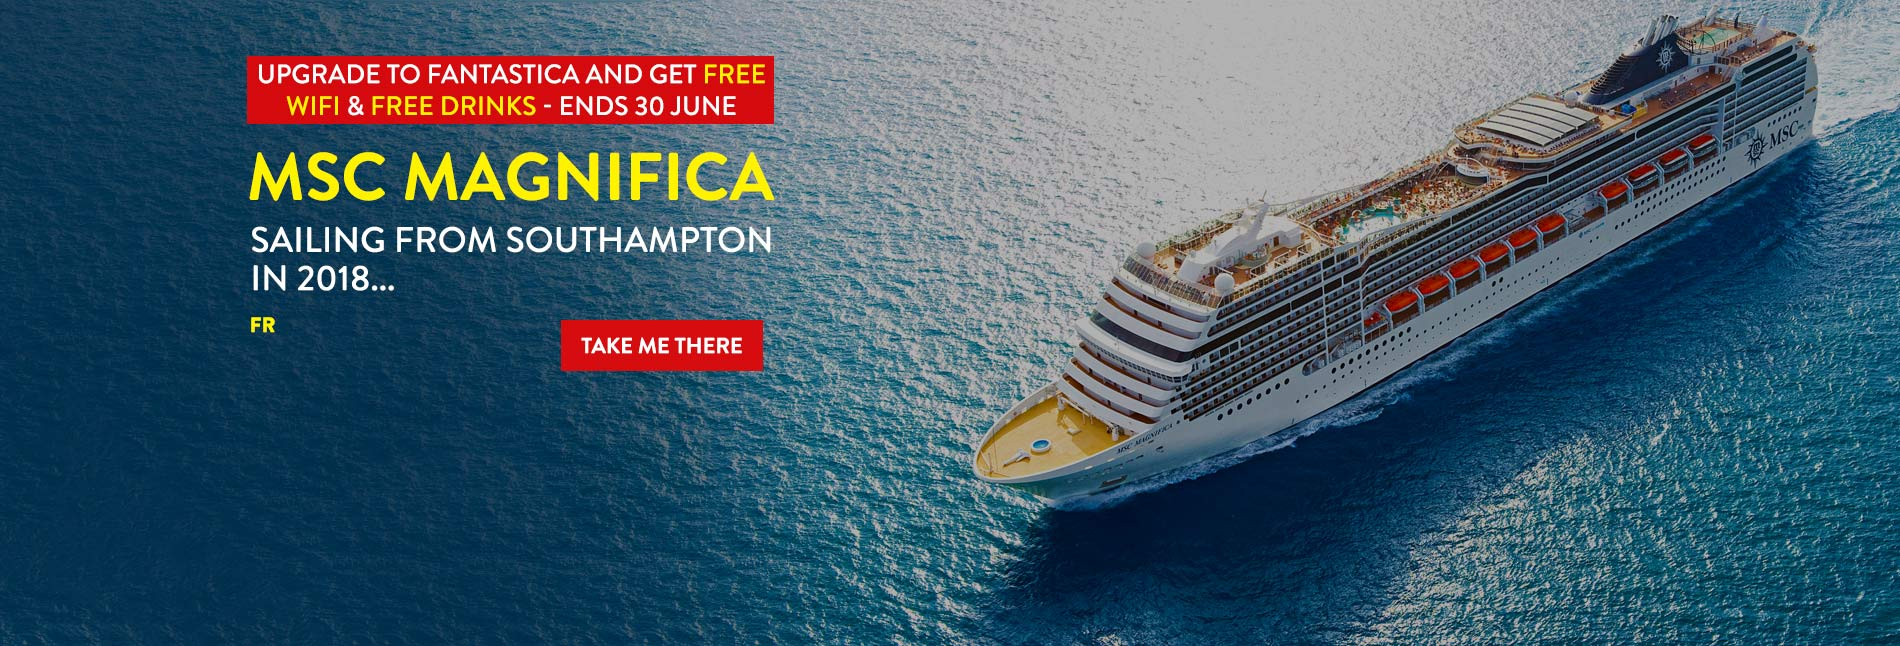 MSC Magnifica Cruise Deals